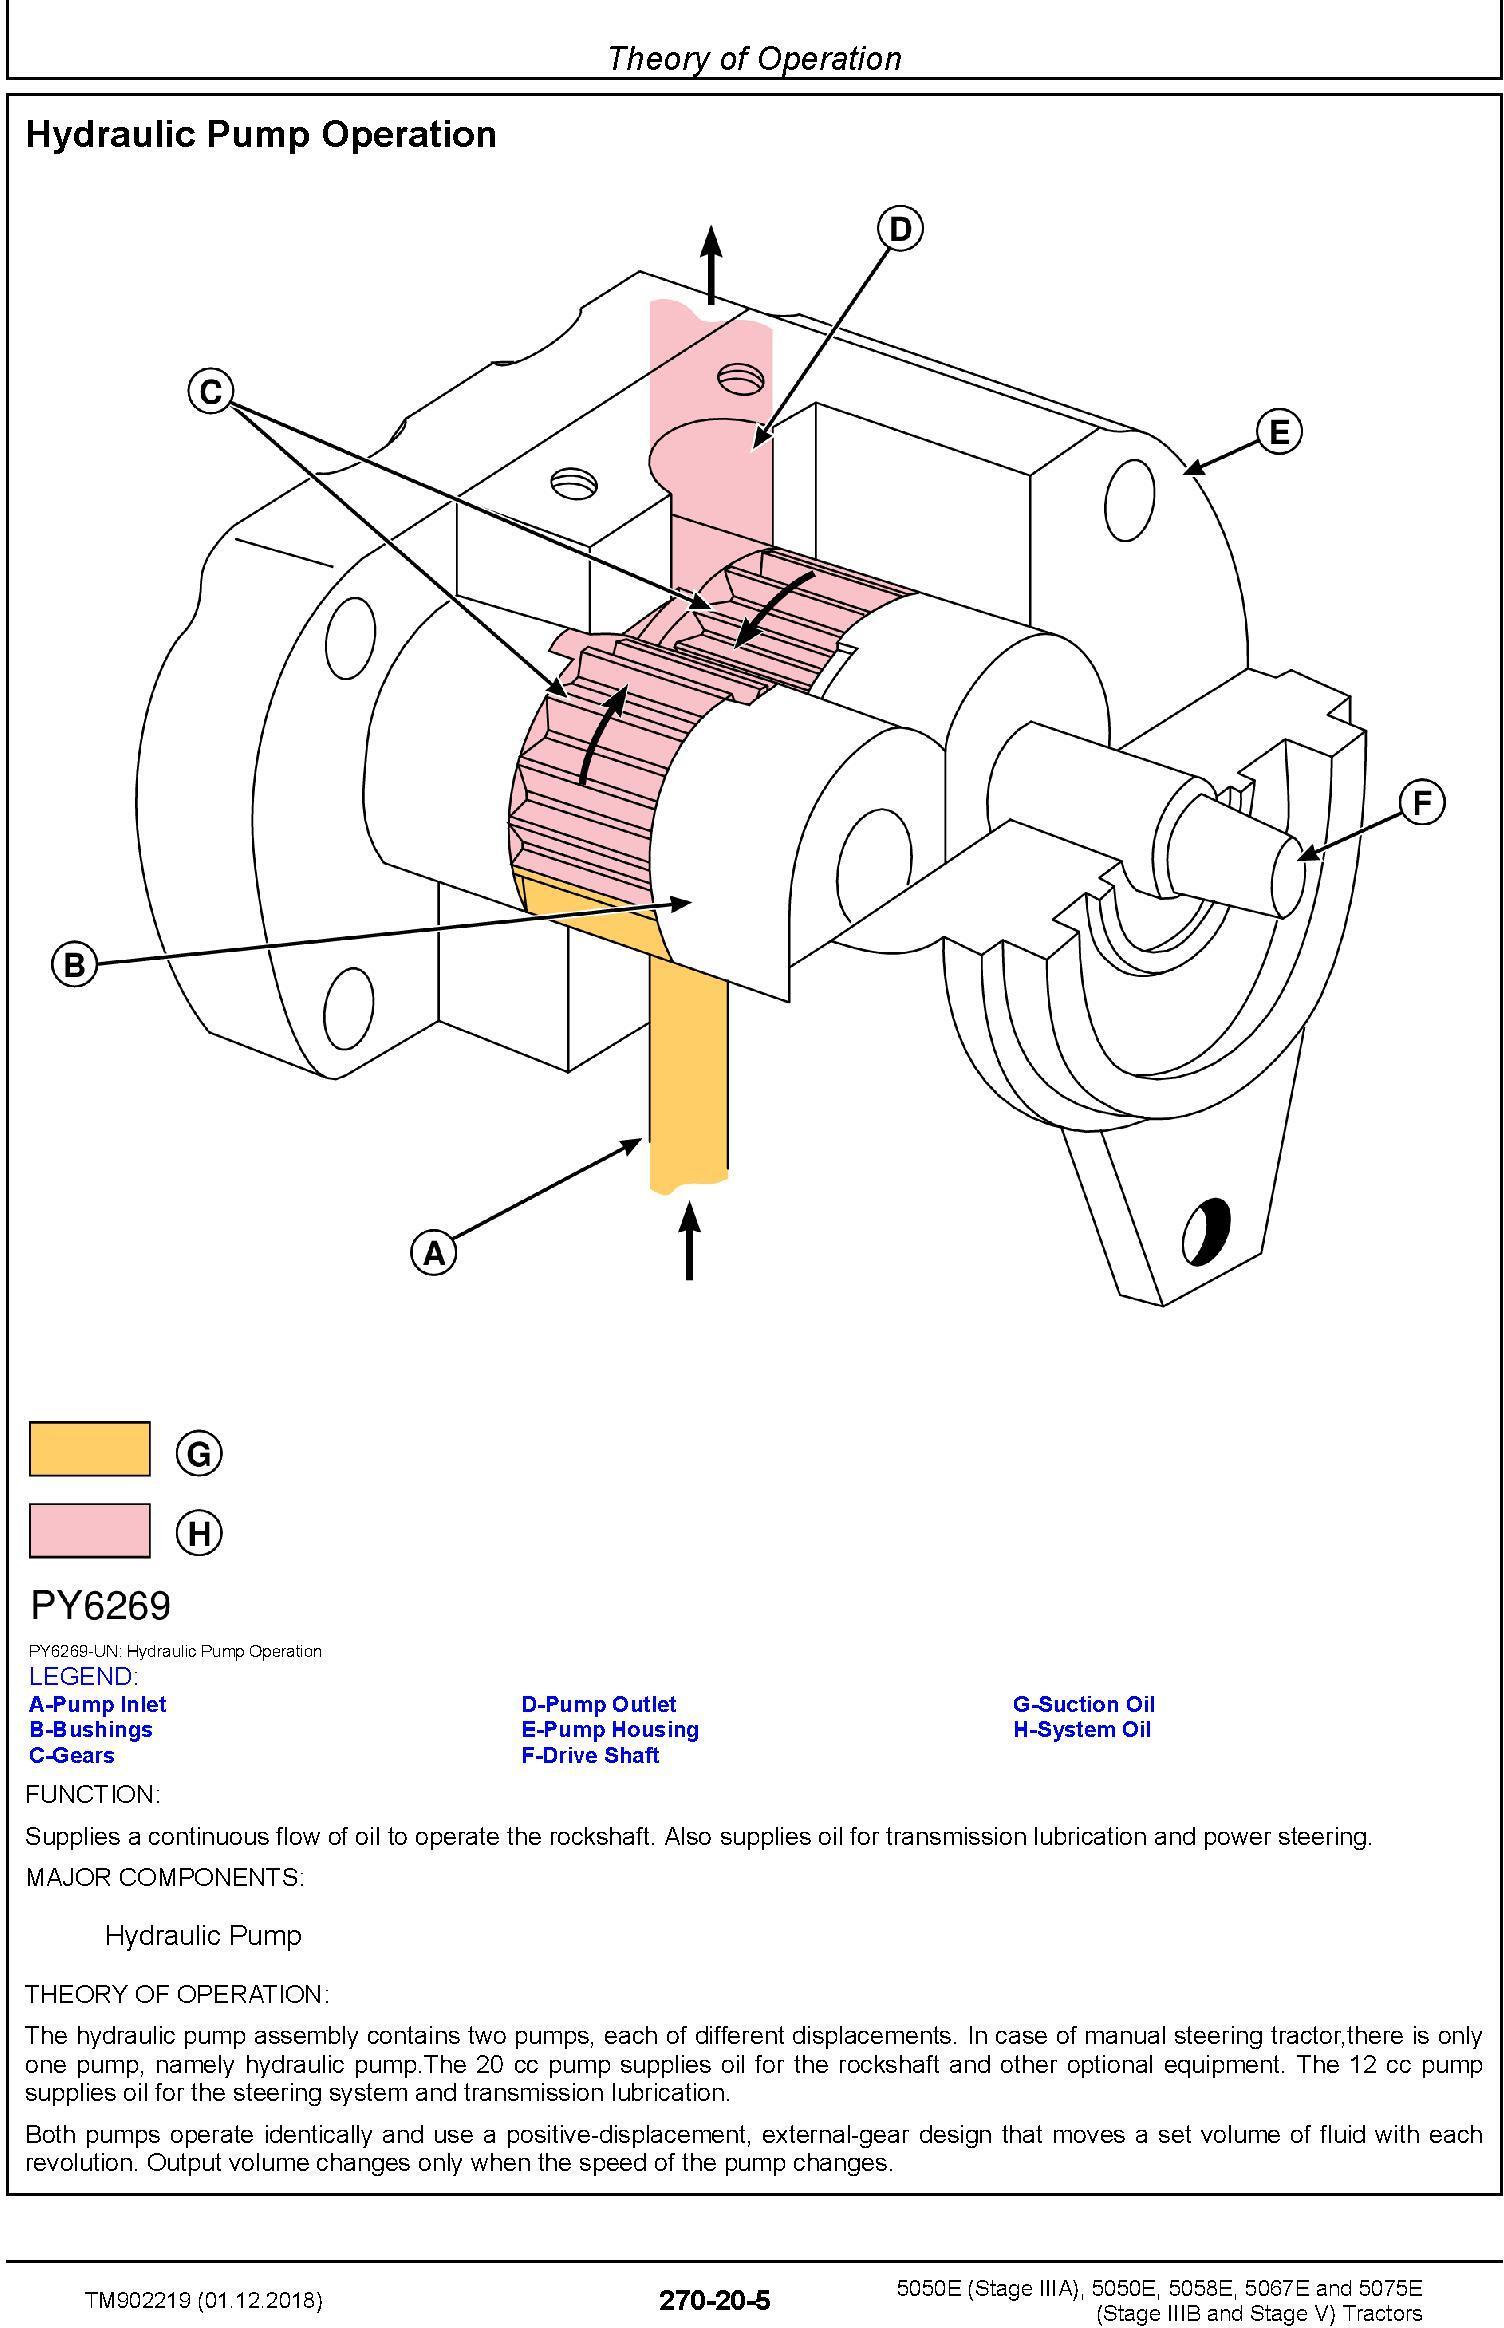 John Deere 5050E, 5050E, 5058E, 5067E, 5075E Tractors Diagnostic Technical Service Manual (TM902219) - 3